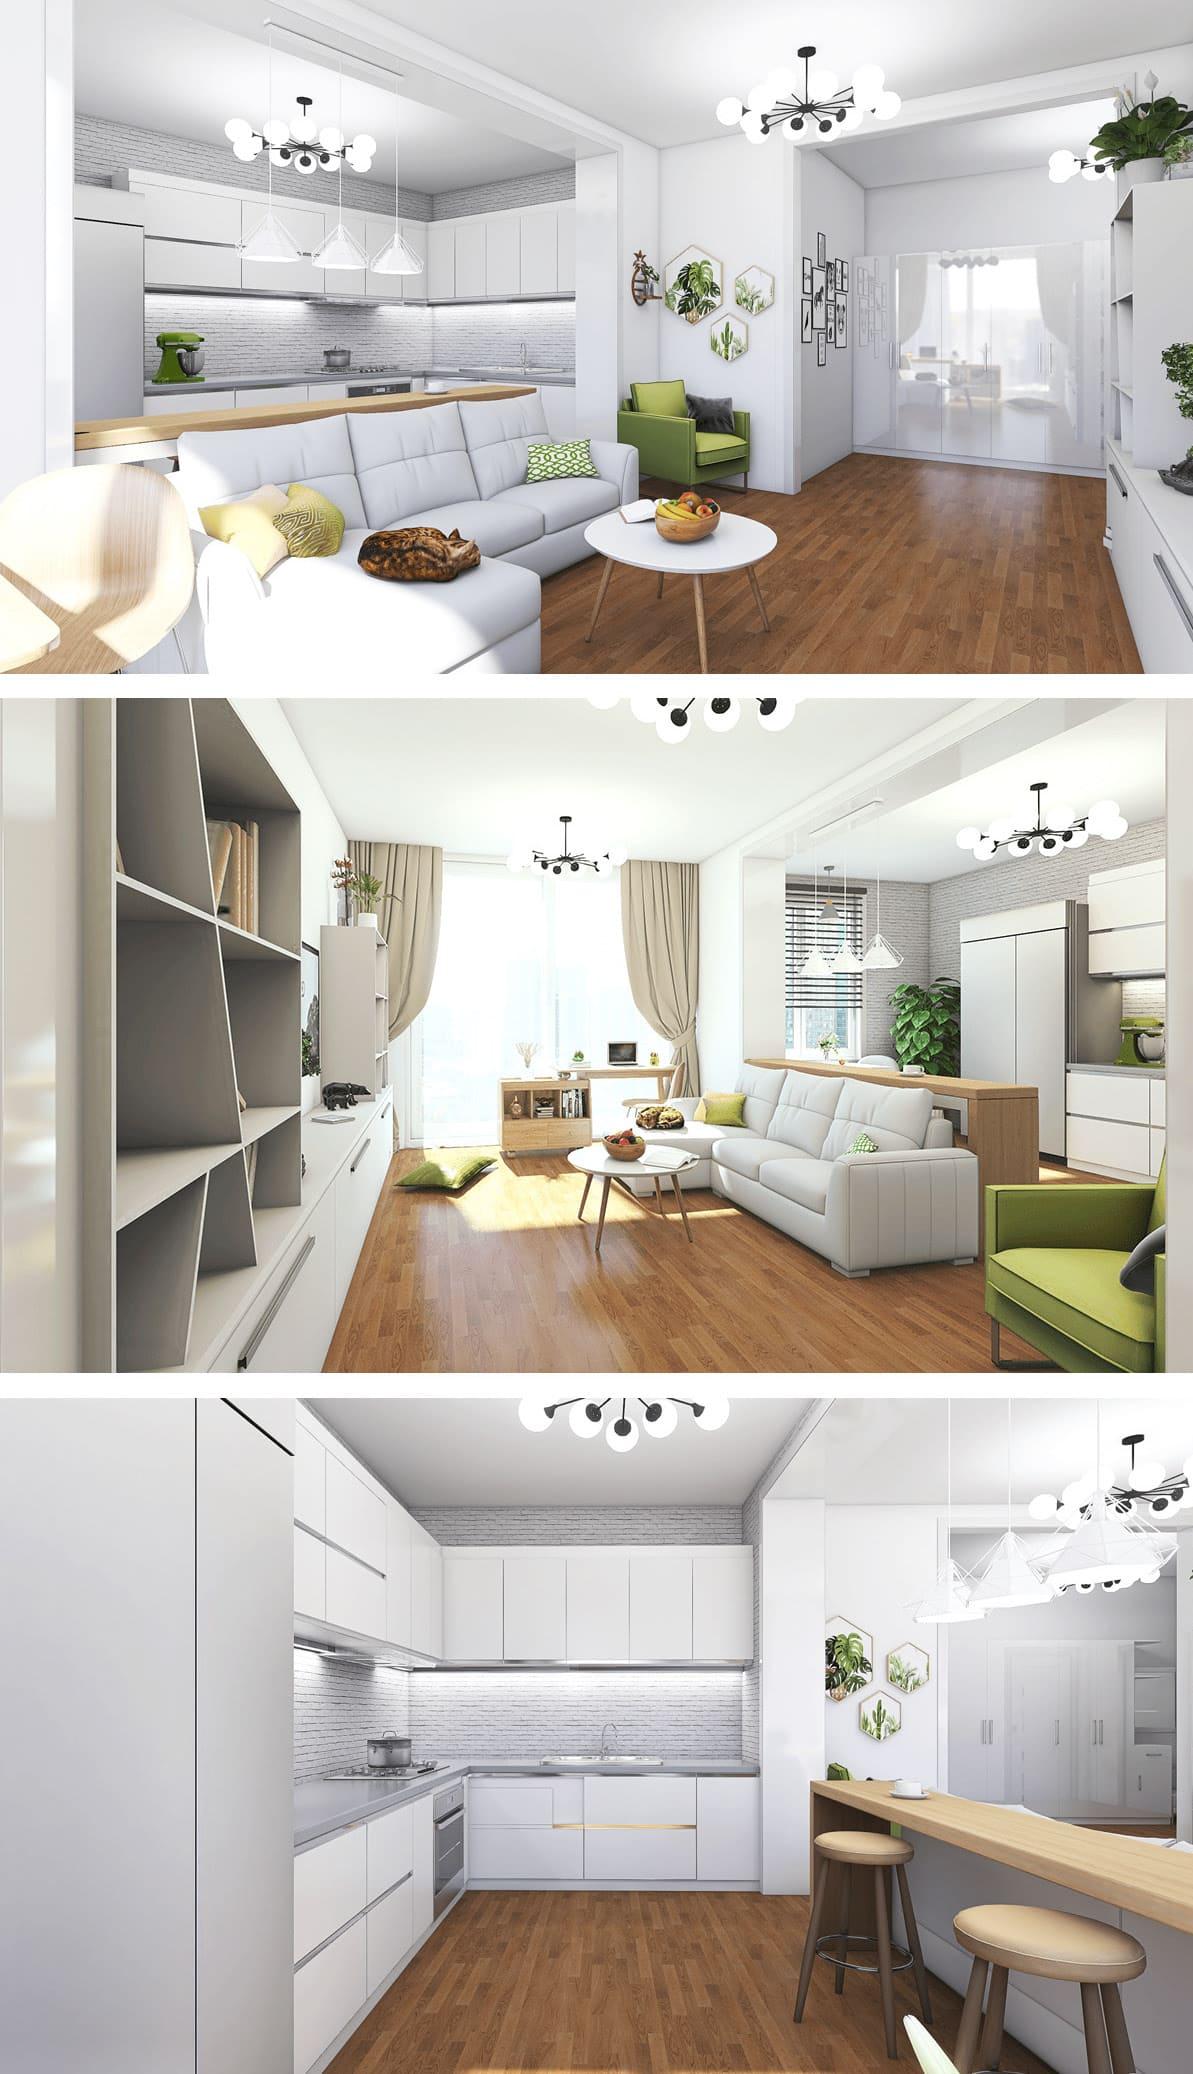 дизайн однокомнатной квартиры фото 25